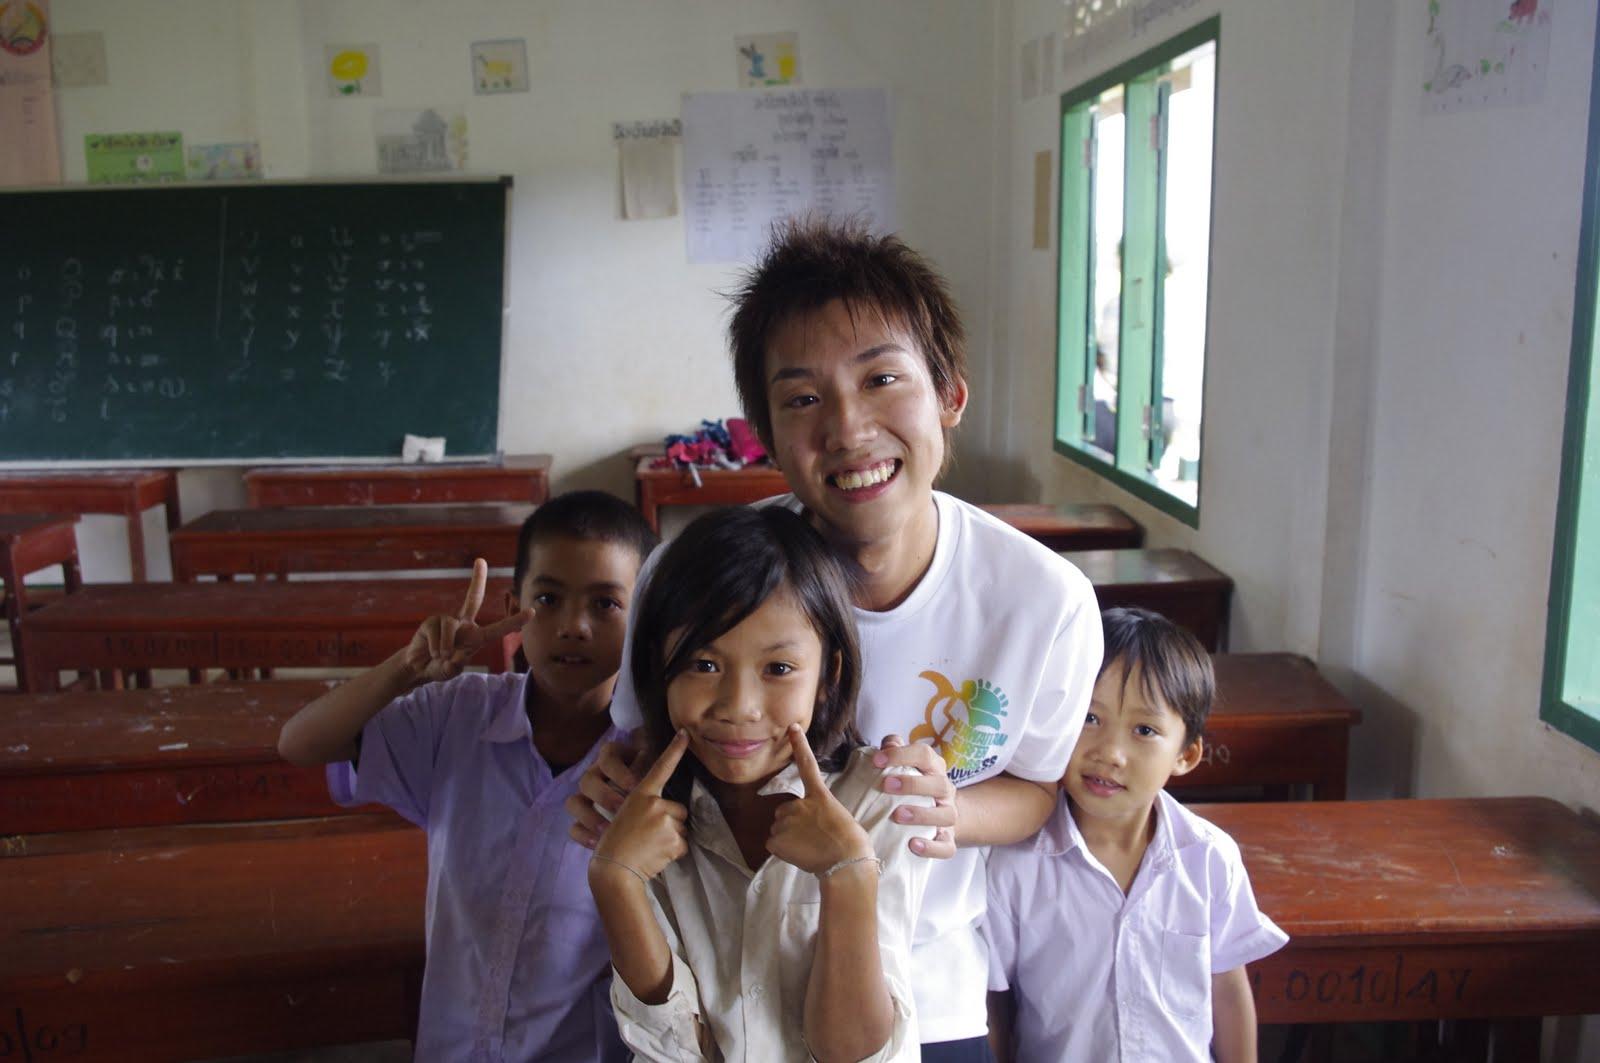 小 学 生 と S E X が し た い 60 [無断転載禁止]©2ch.netYouTube動画>14本 ->画像>966枚